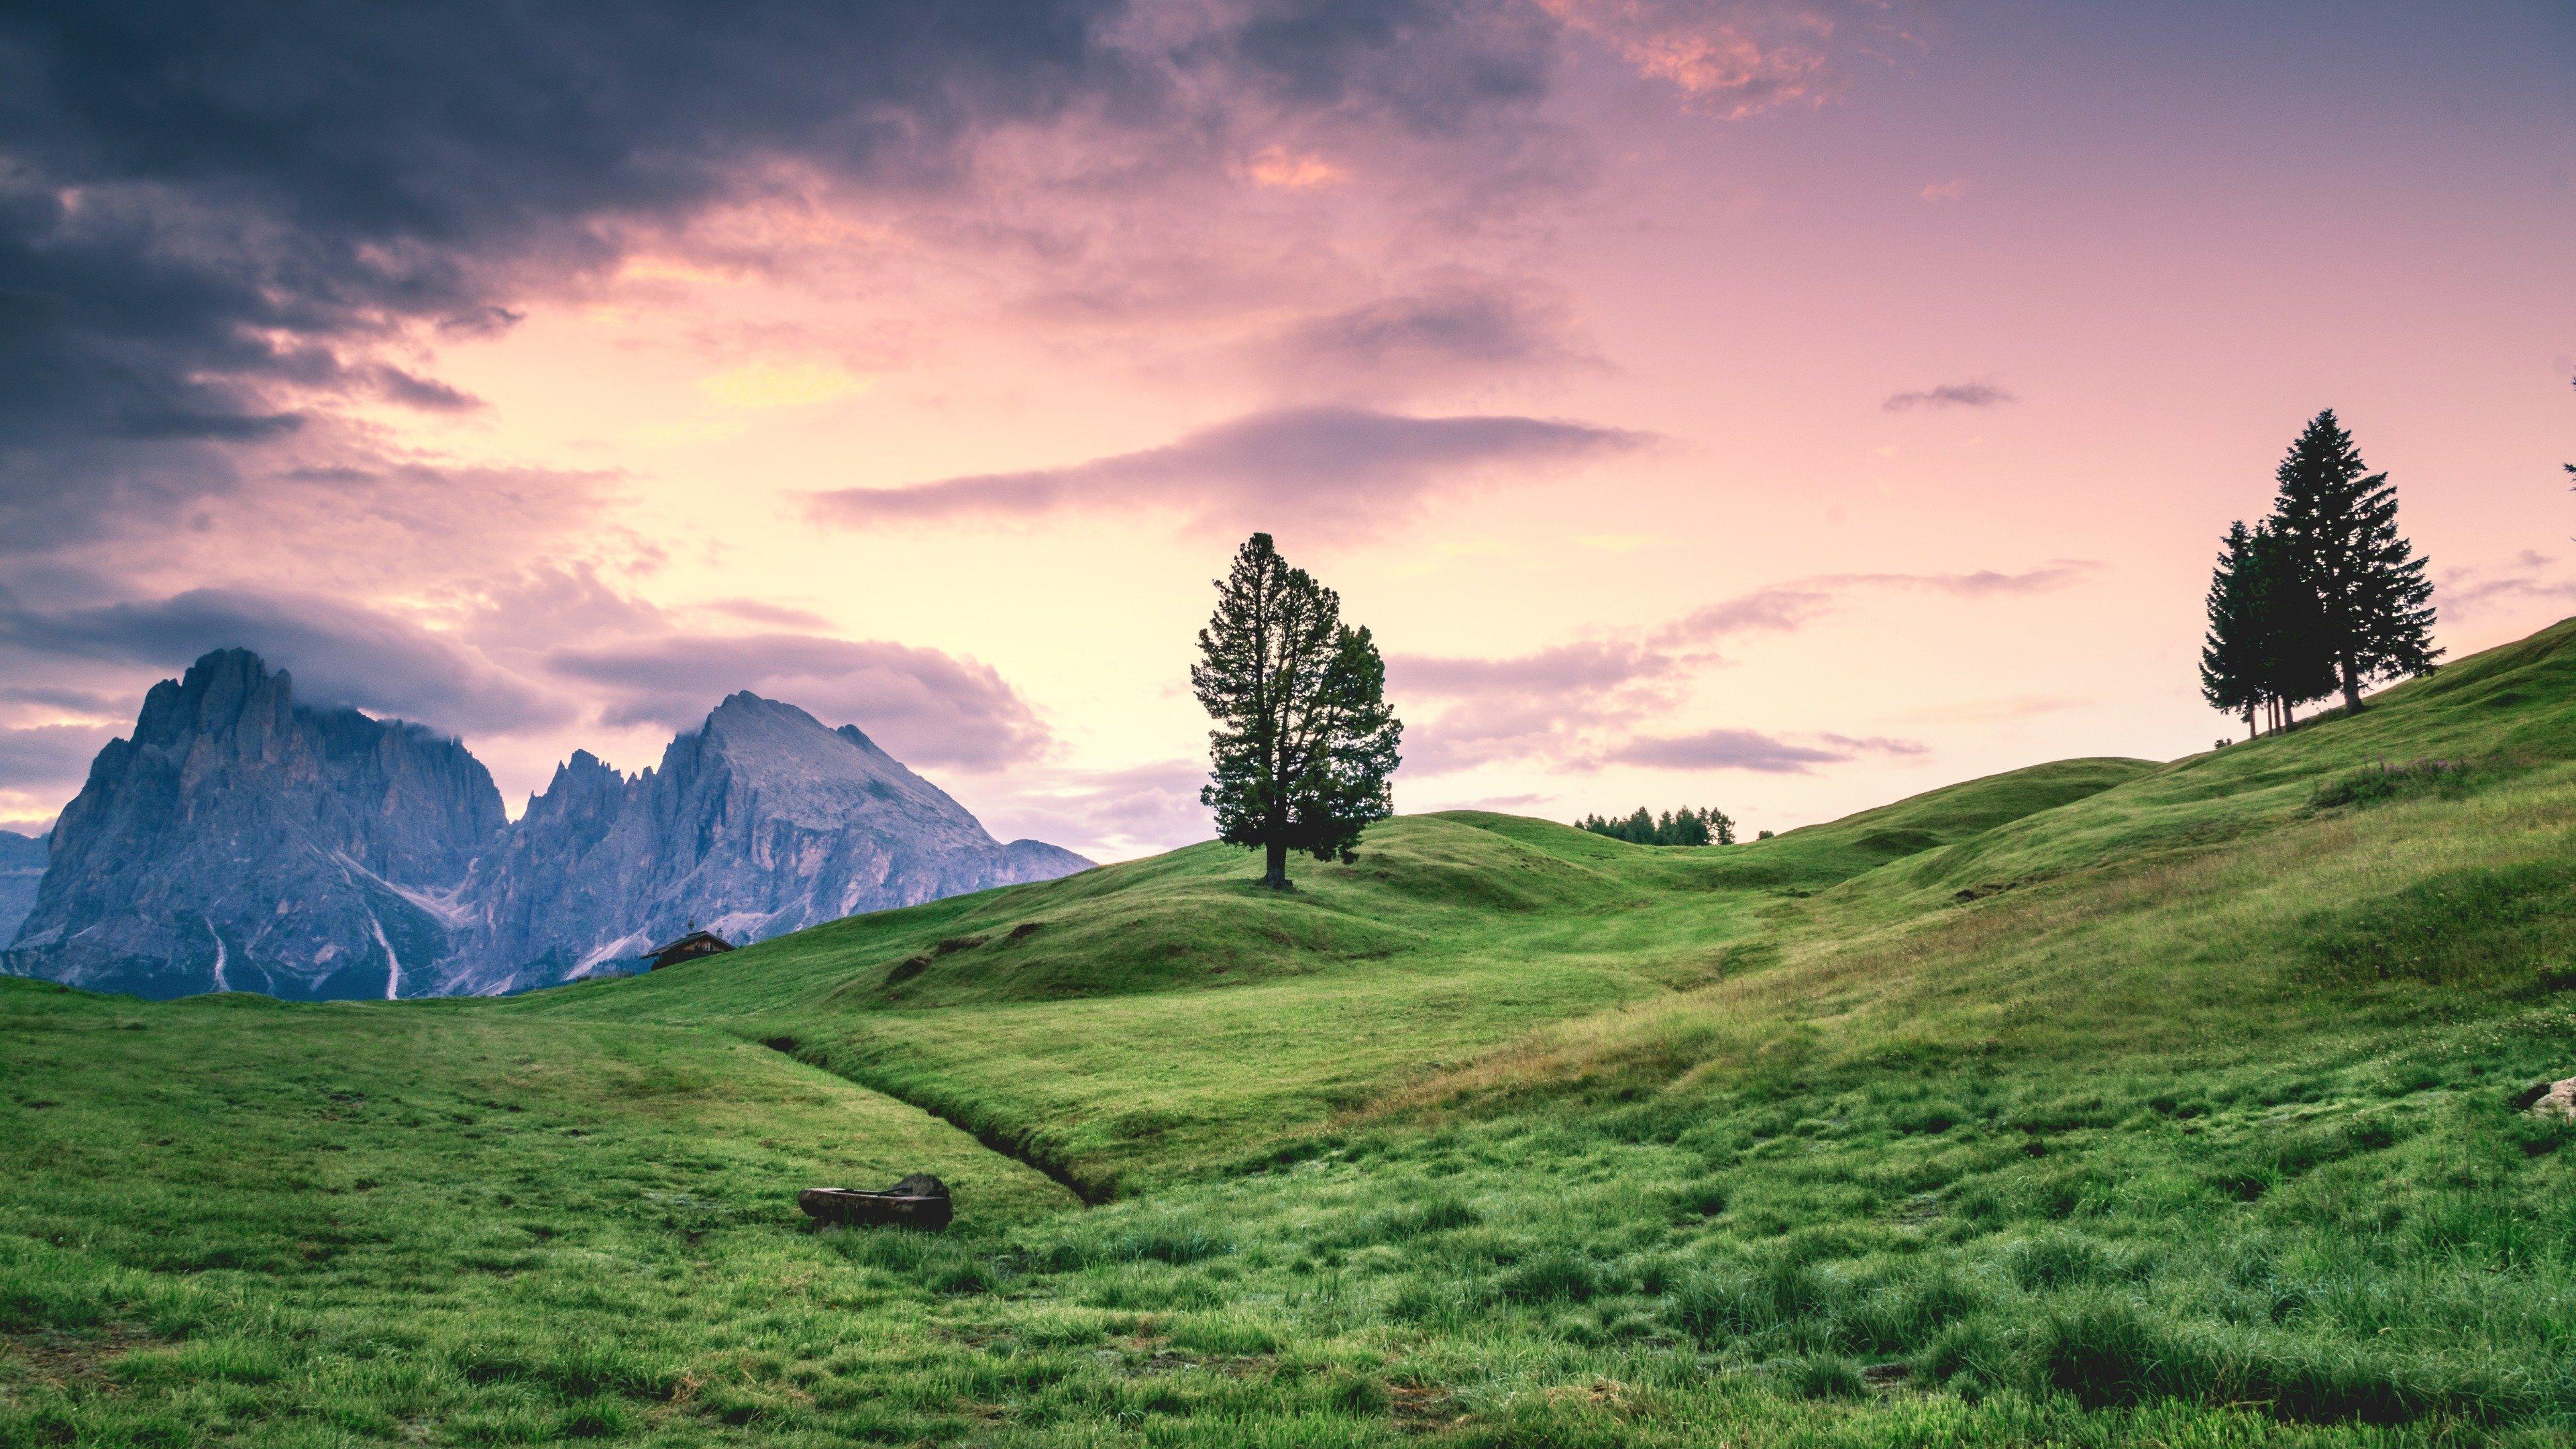 Green Grass Rocks And Beautiful Sky 4k Wallpaper